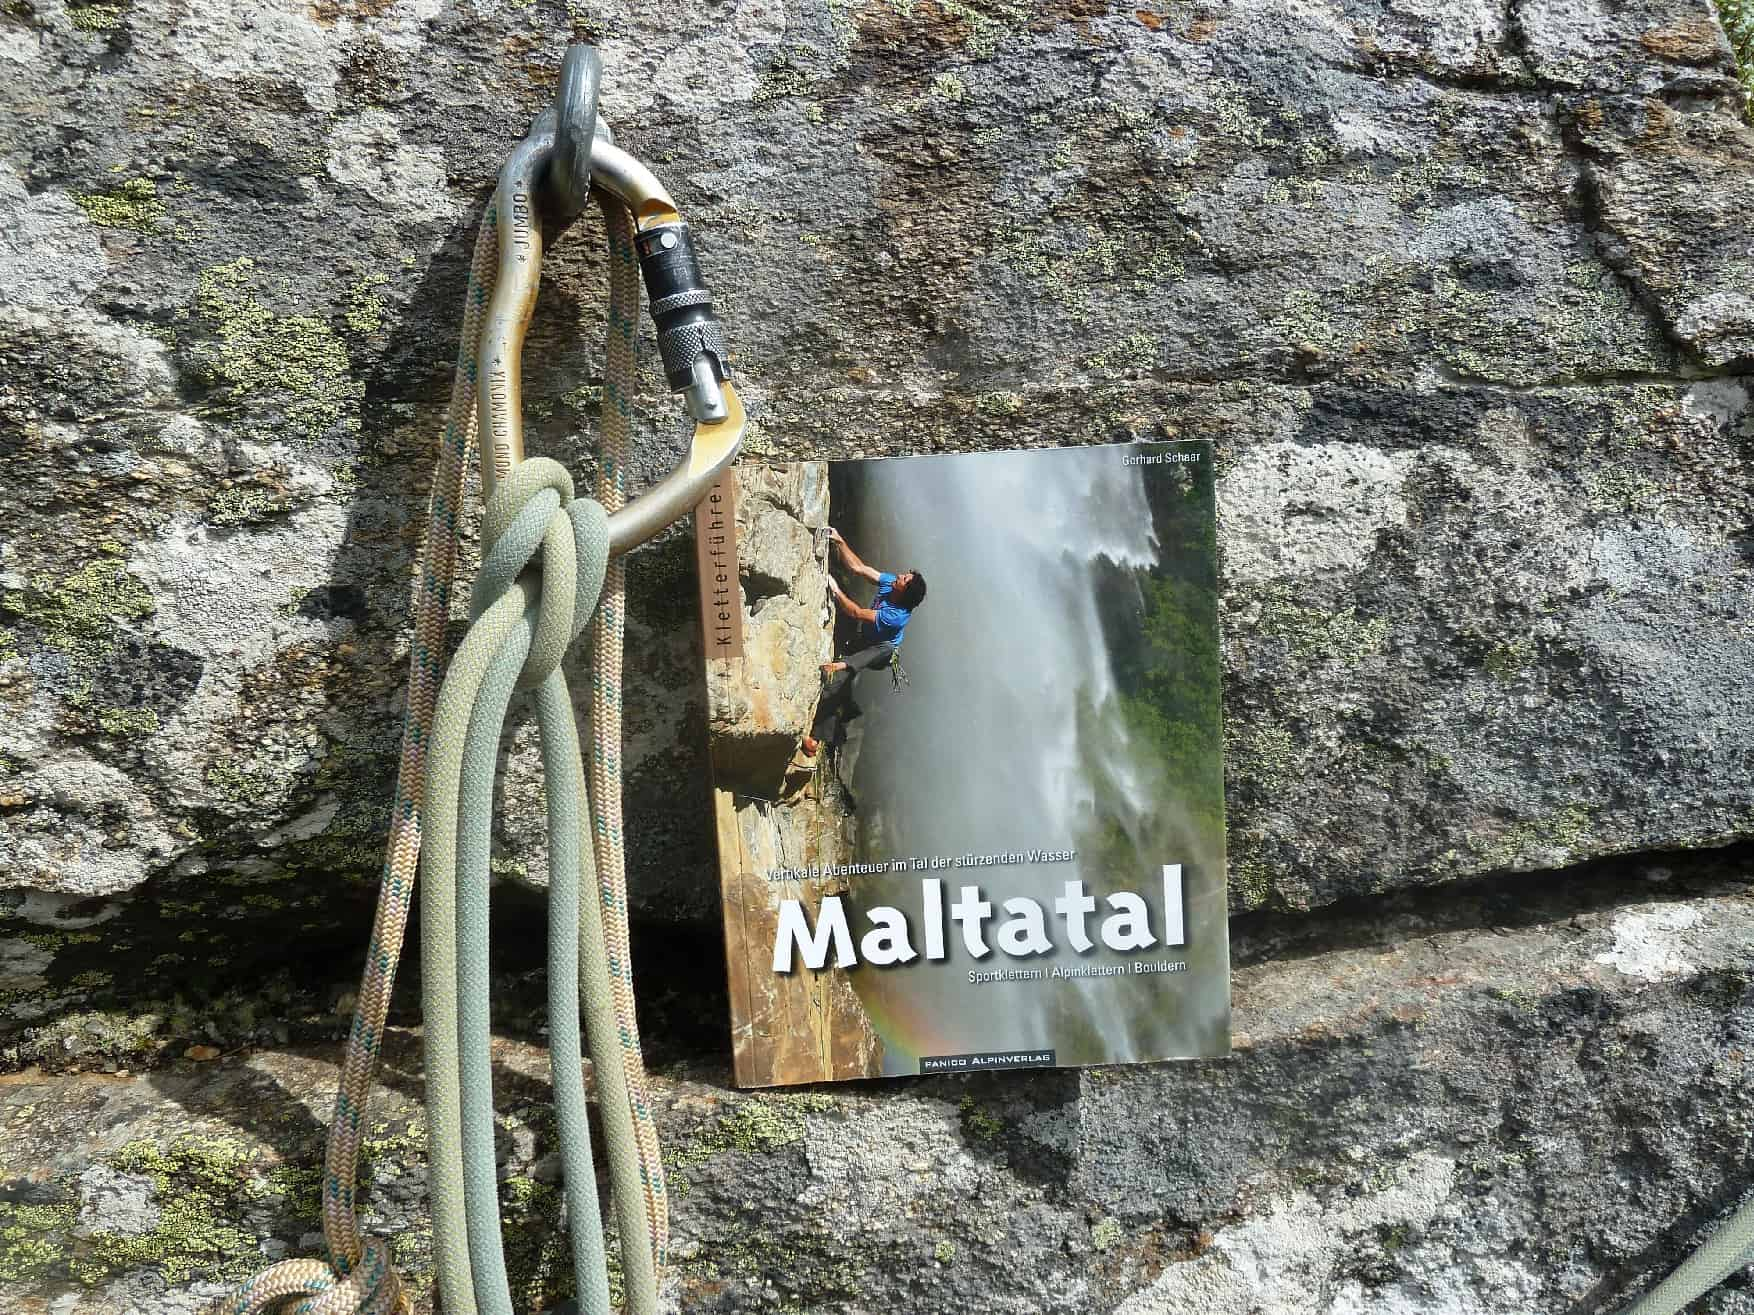 Klettern im Maltatal